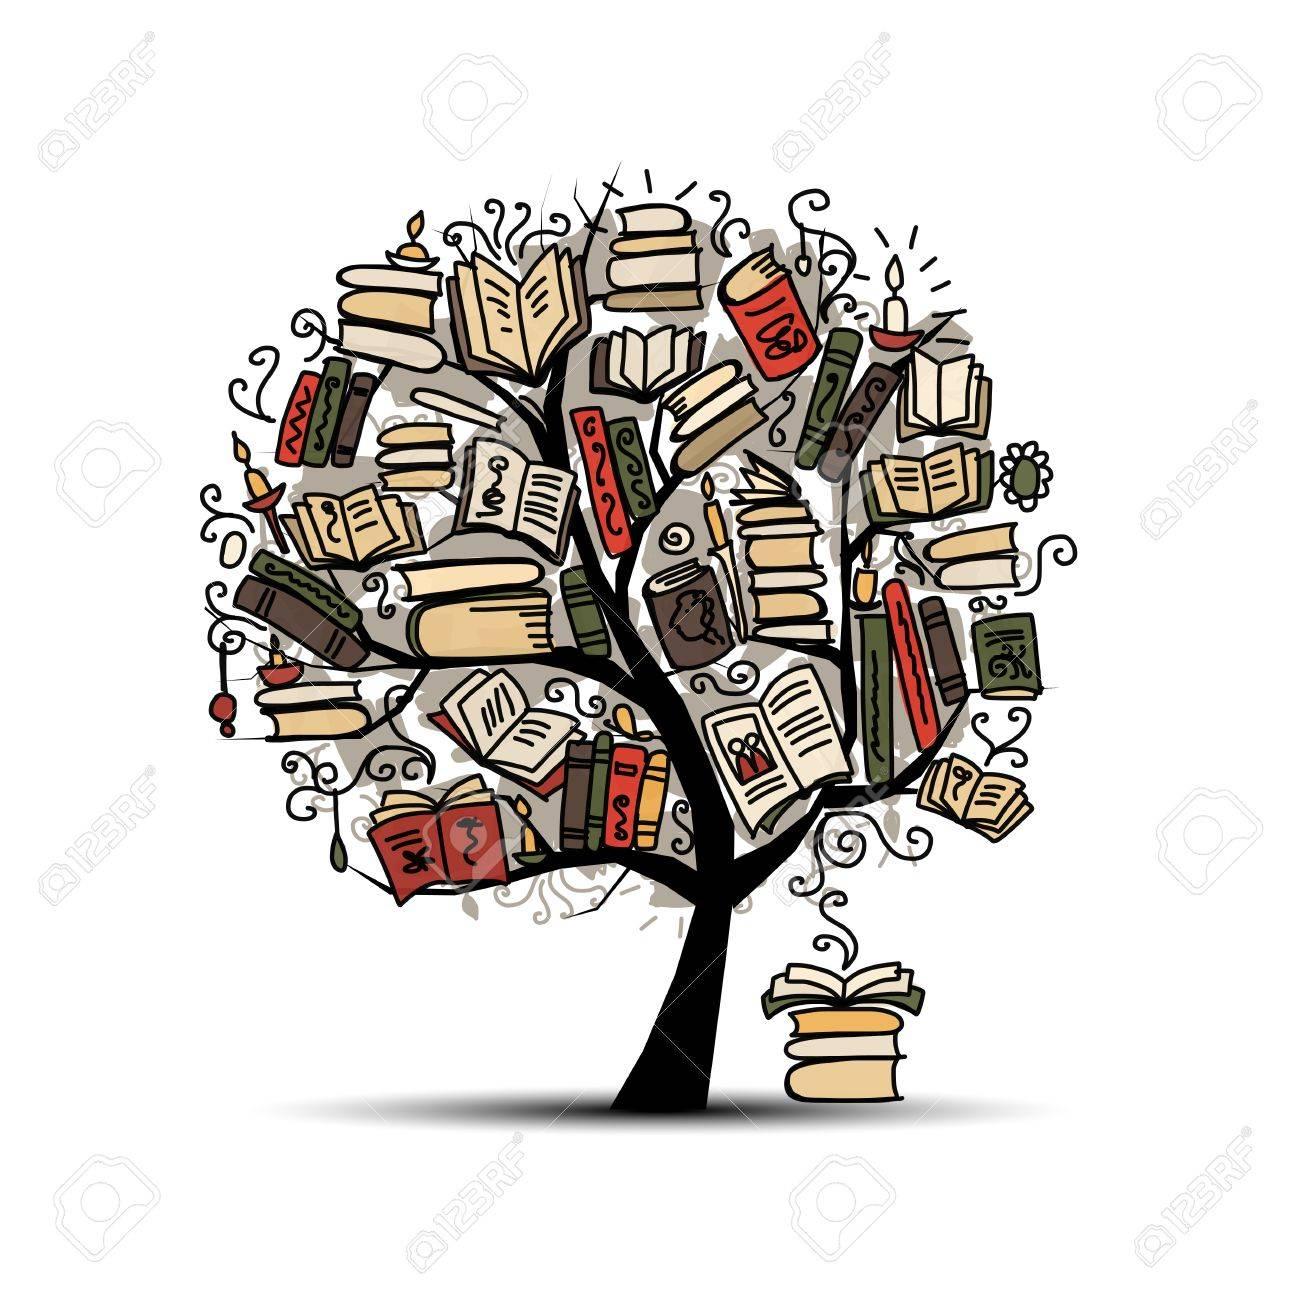 Book tree, sketch for your design. illustration - 68555696